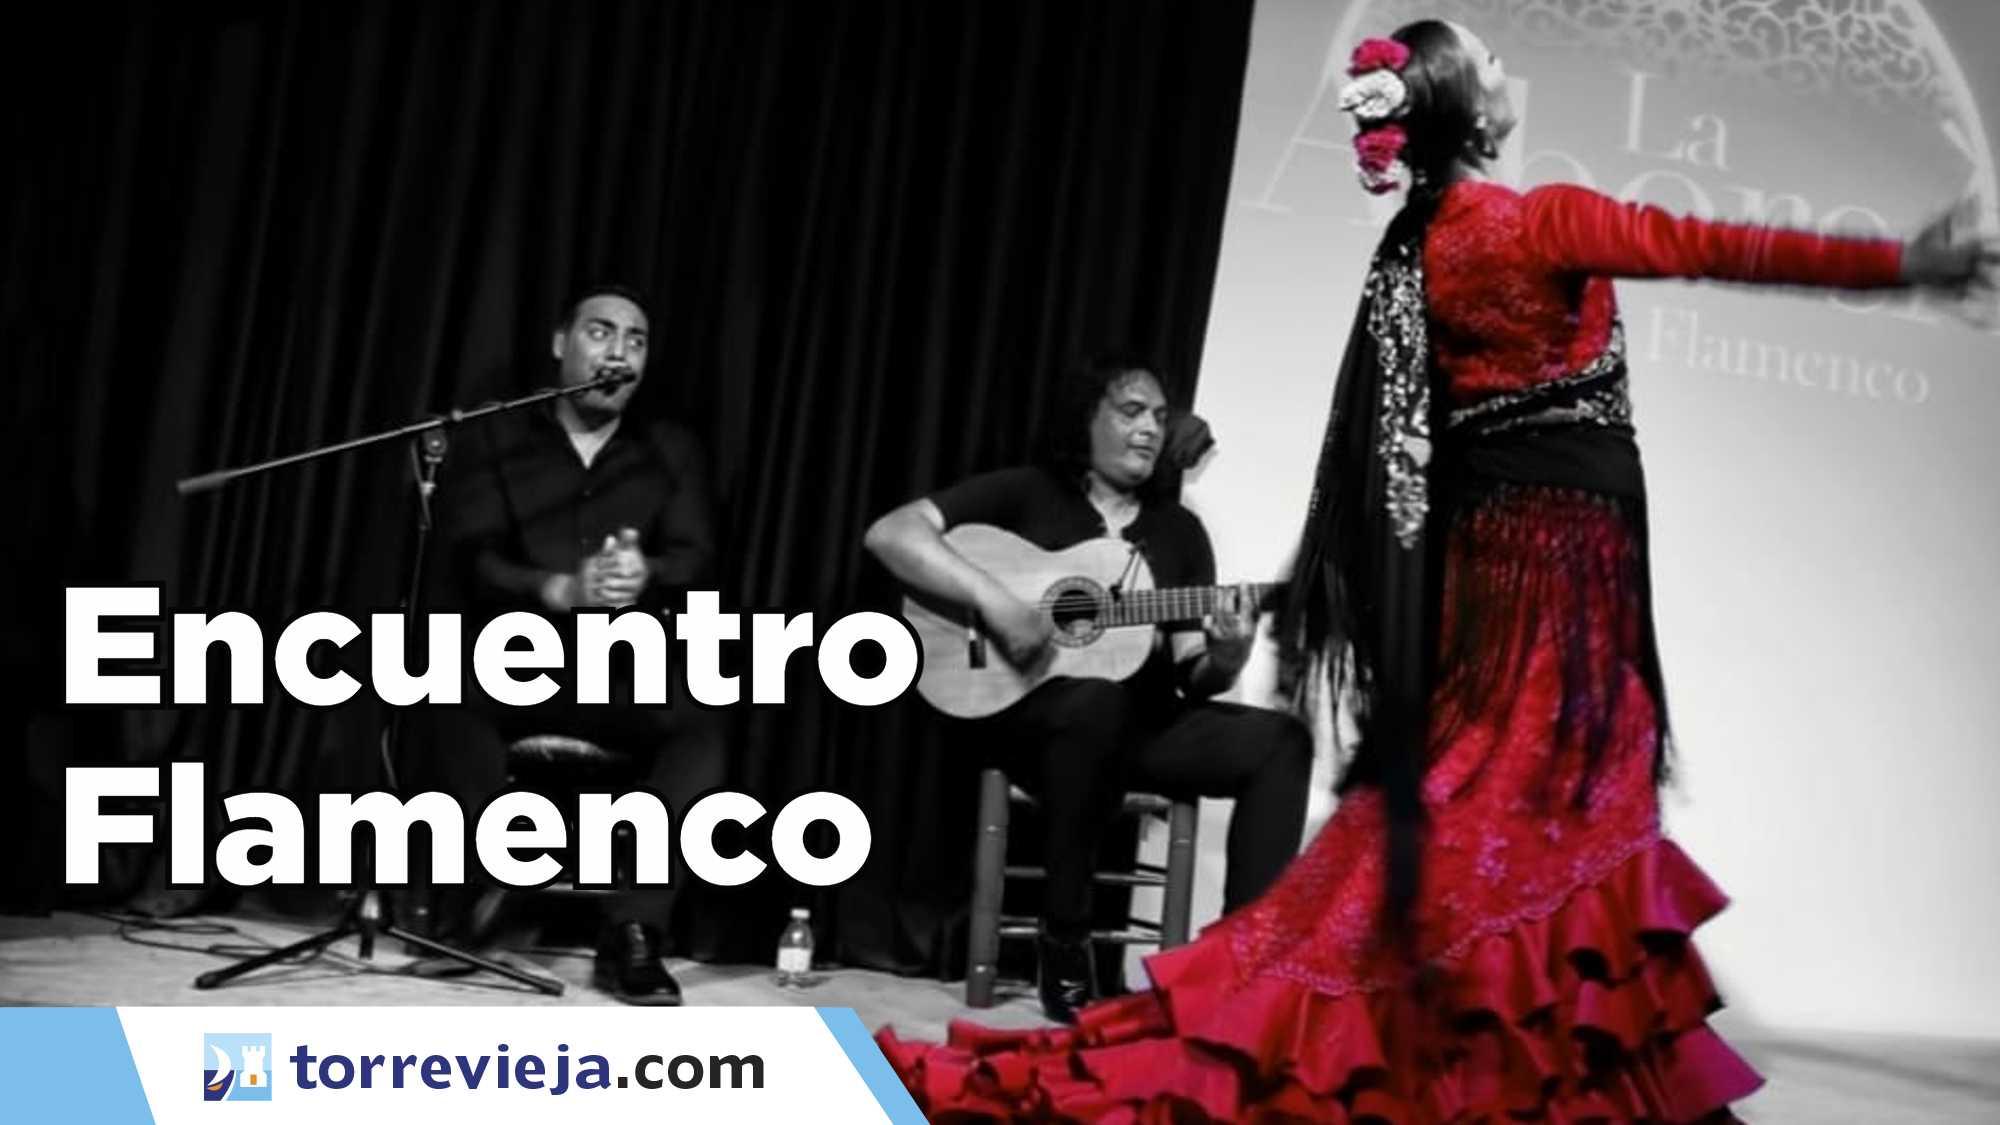 XV Встреча фламенко город Торревьеха2021